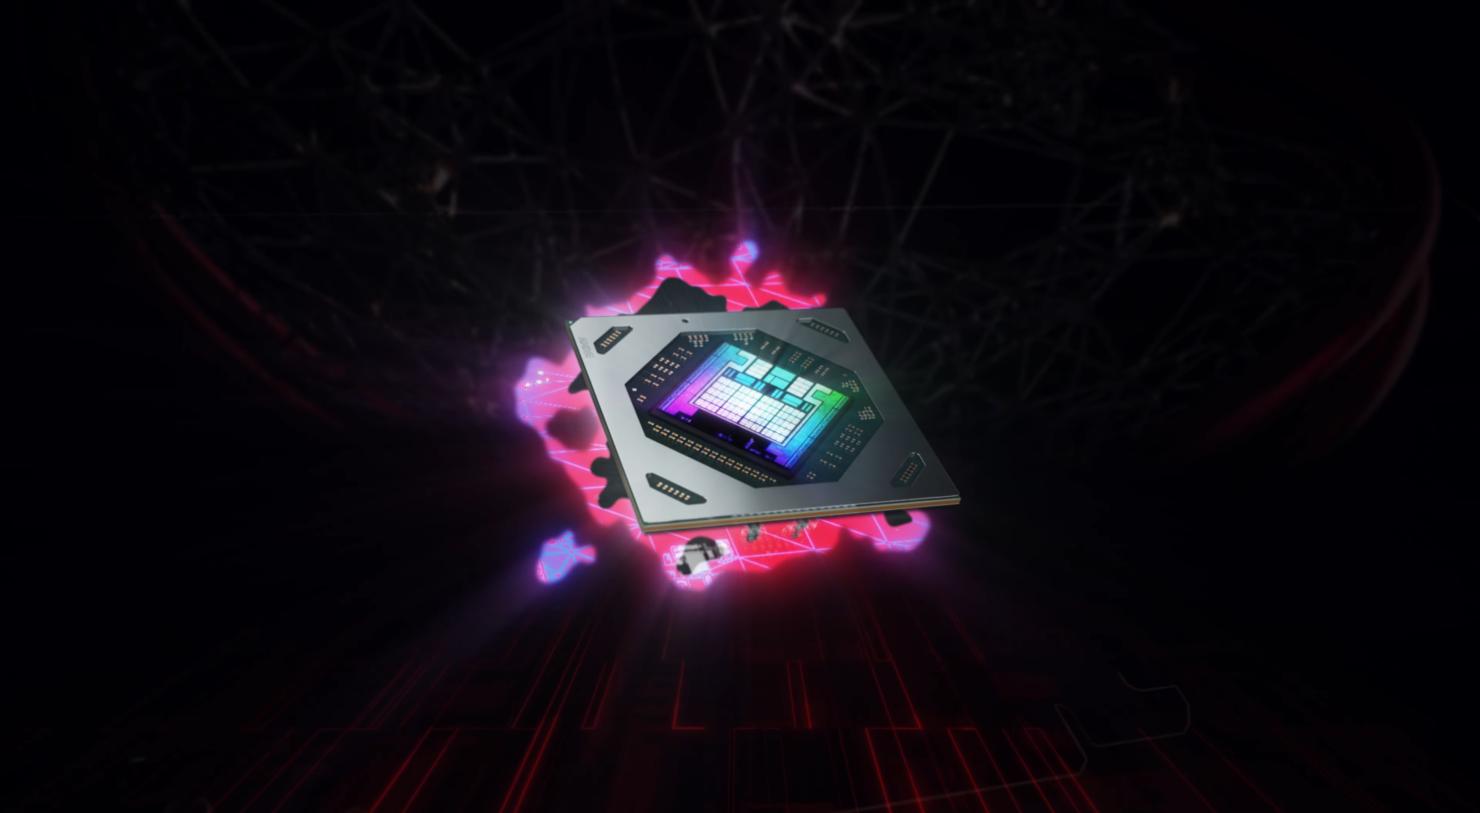 amd-radeon-rx-6800m-rdna-2-high-end-mobility-gpu-spotted,-based-on-navi-22-sku